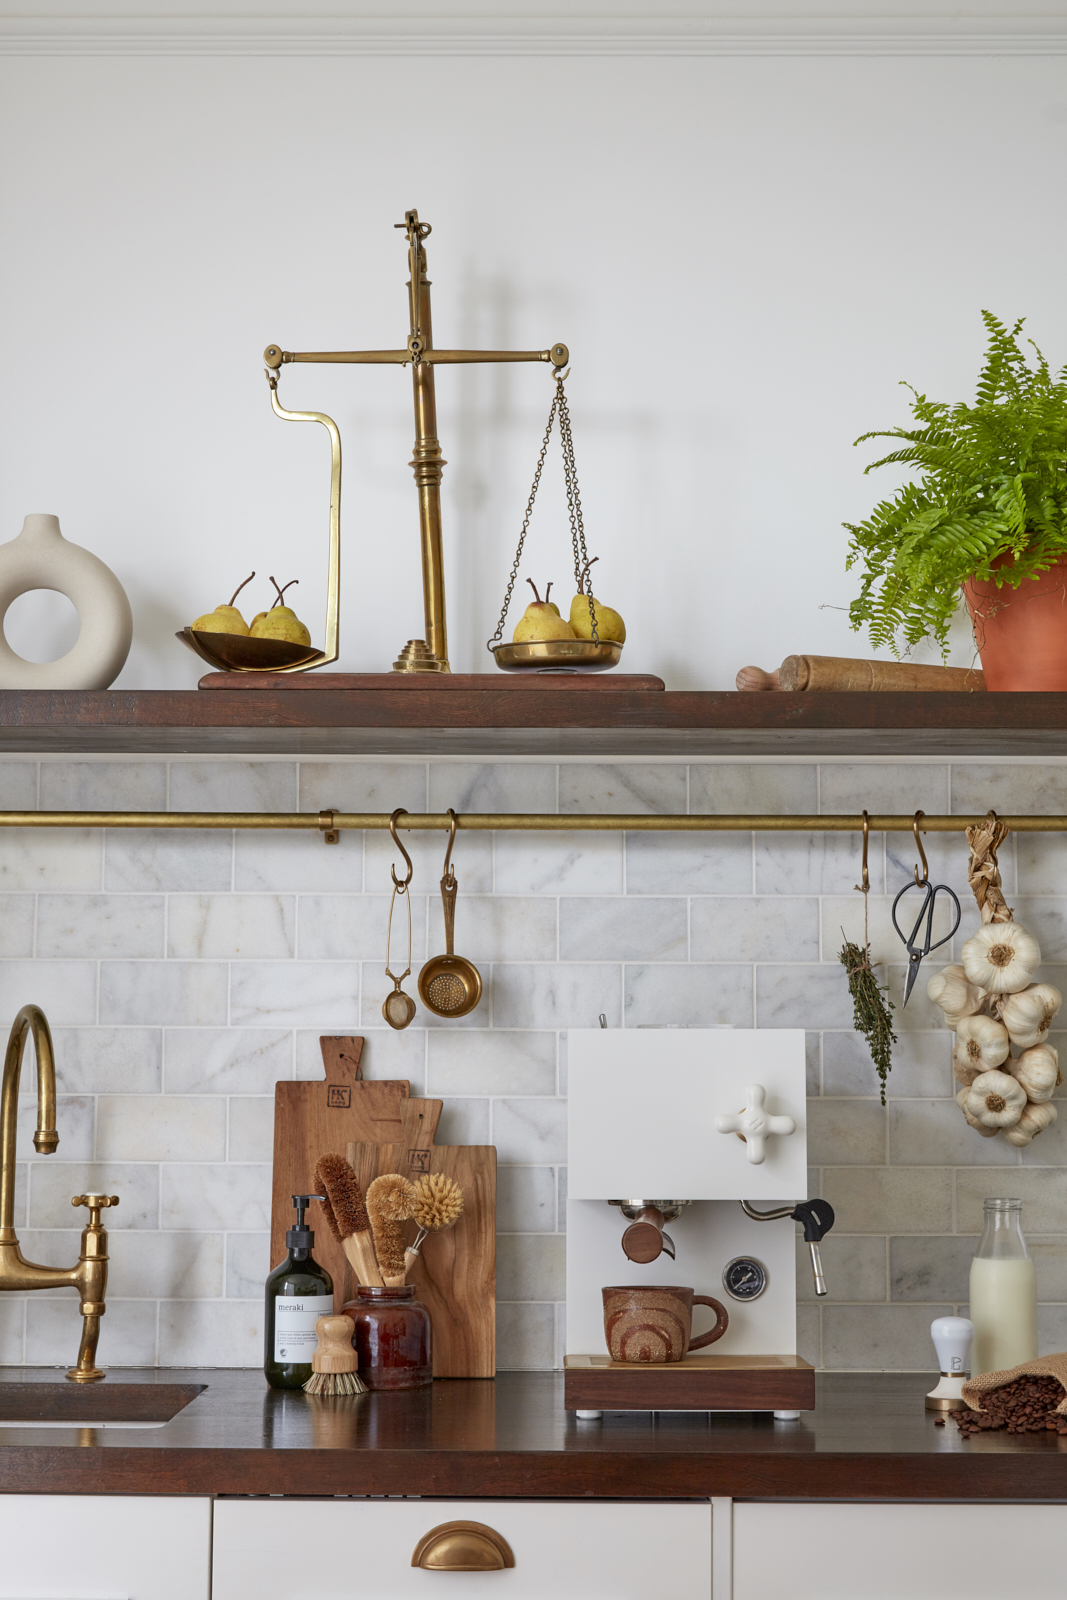 Belle Vue Georgian apartment kitchen shelf styling